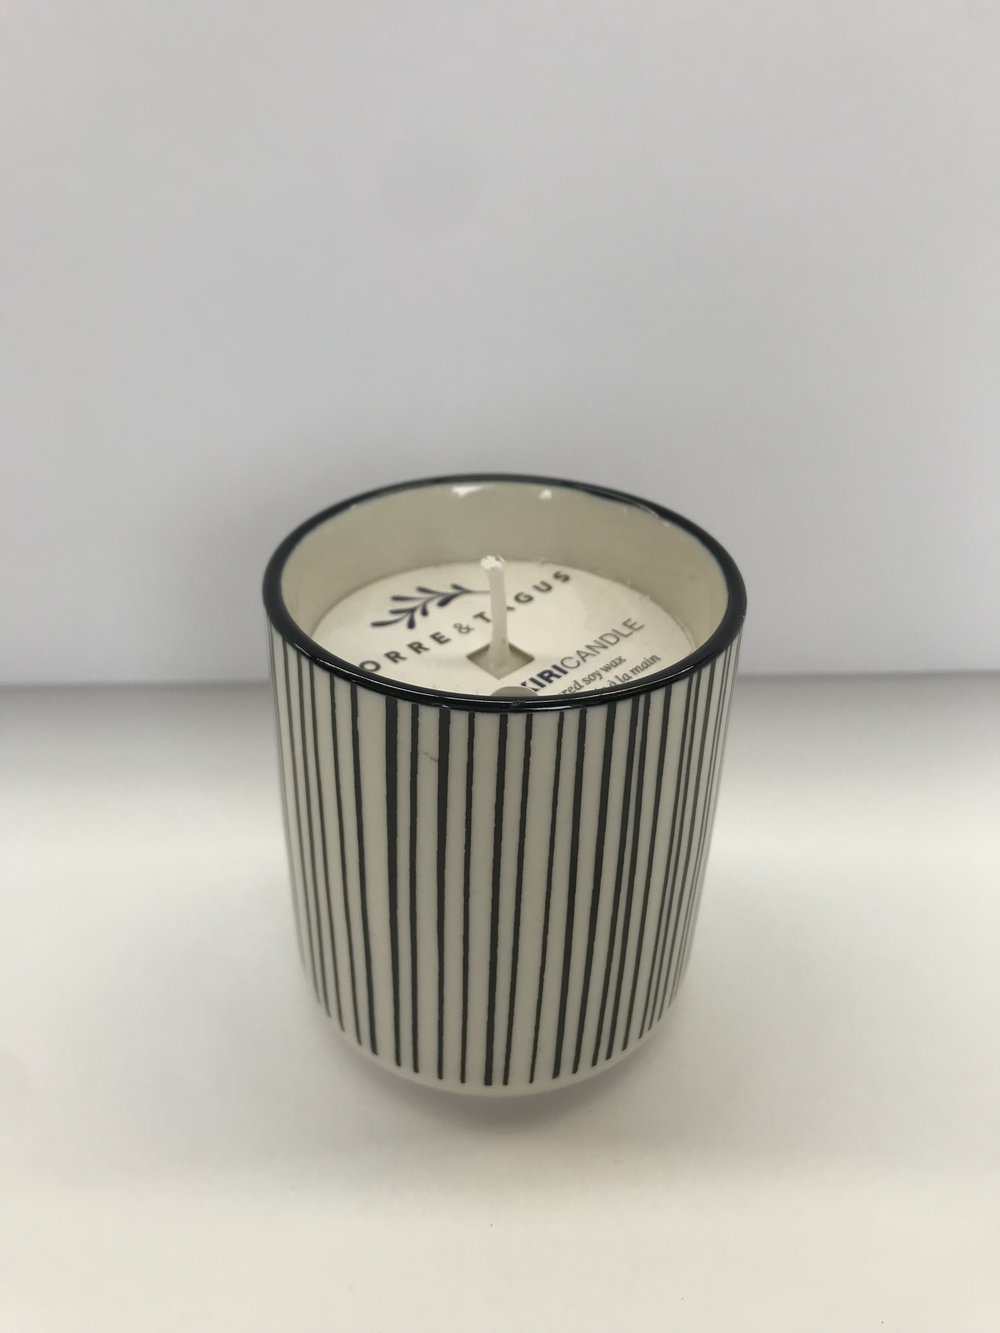 "Black Line Votive Candle (Unscented) - Colour:  Black + WhiteDimensions:  2.5"" Diameter x 3"" HPrice:  $10.00 + HSTSale Price:  $7.00 + HST"